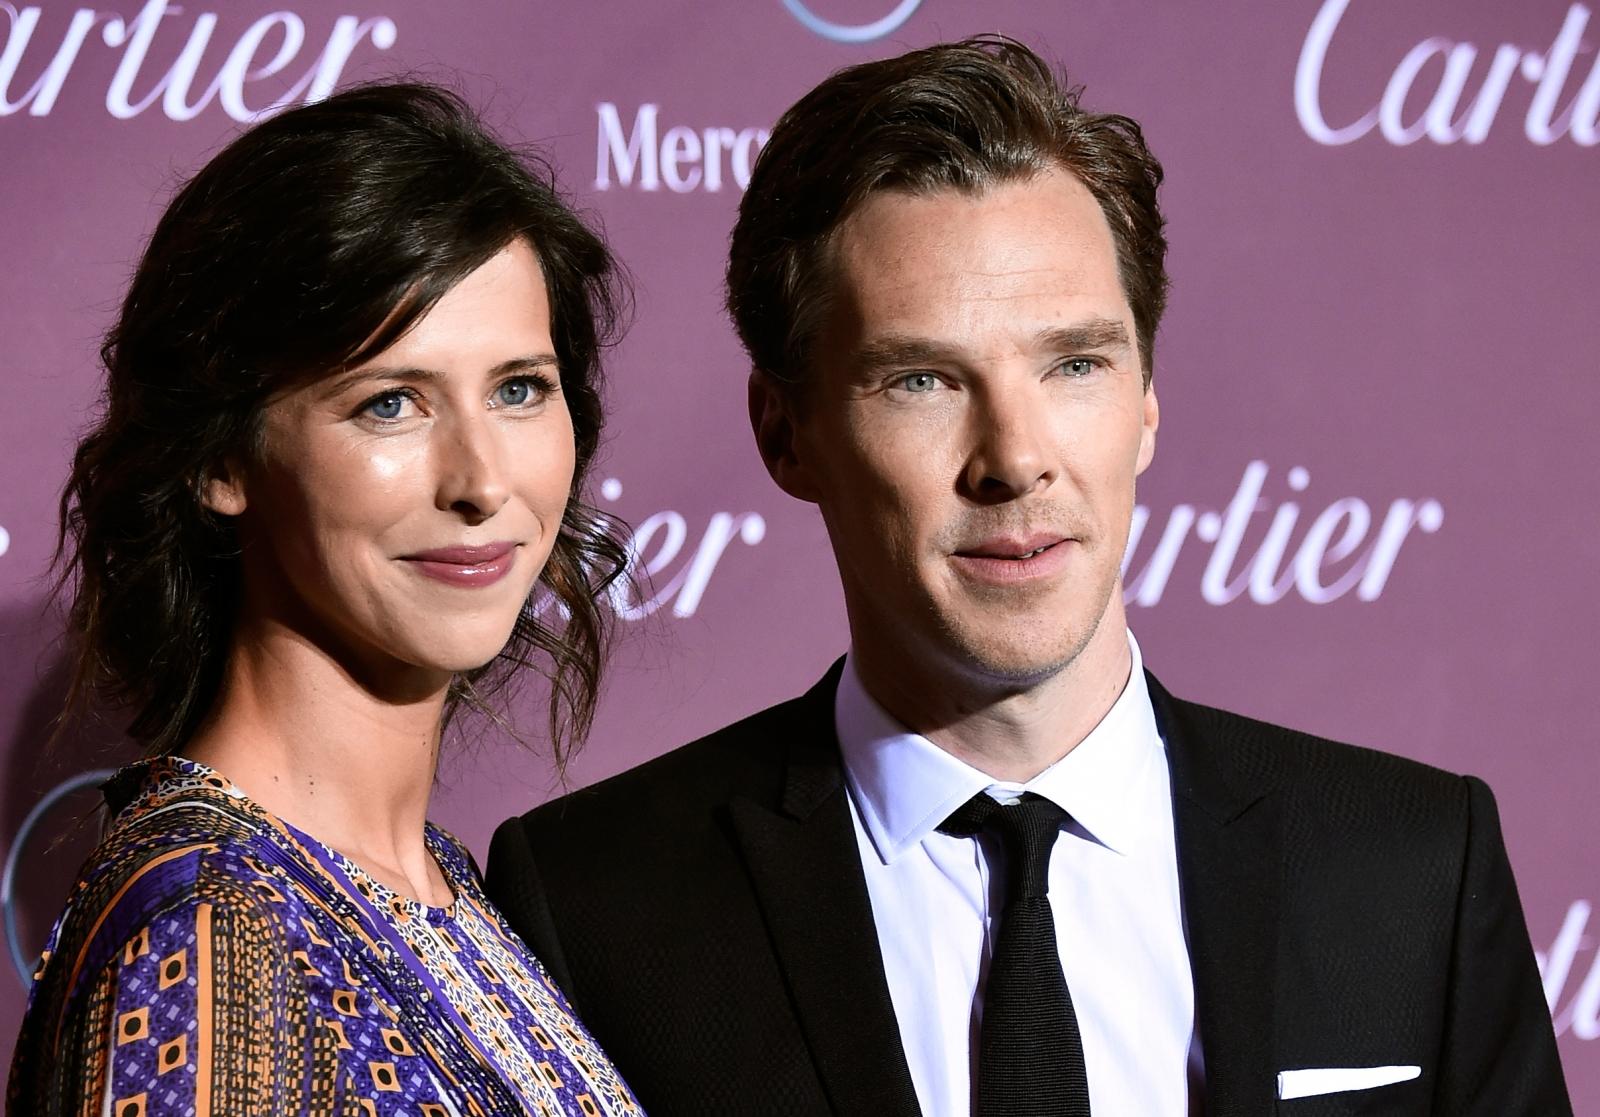 benedict-cumberbatch jpg w 736 h 514 l 50 t 40 Benedict Cumberbatch